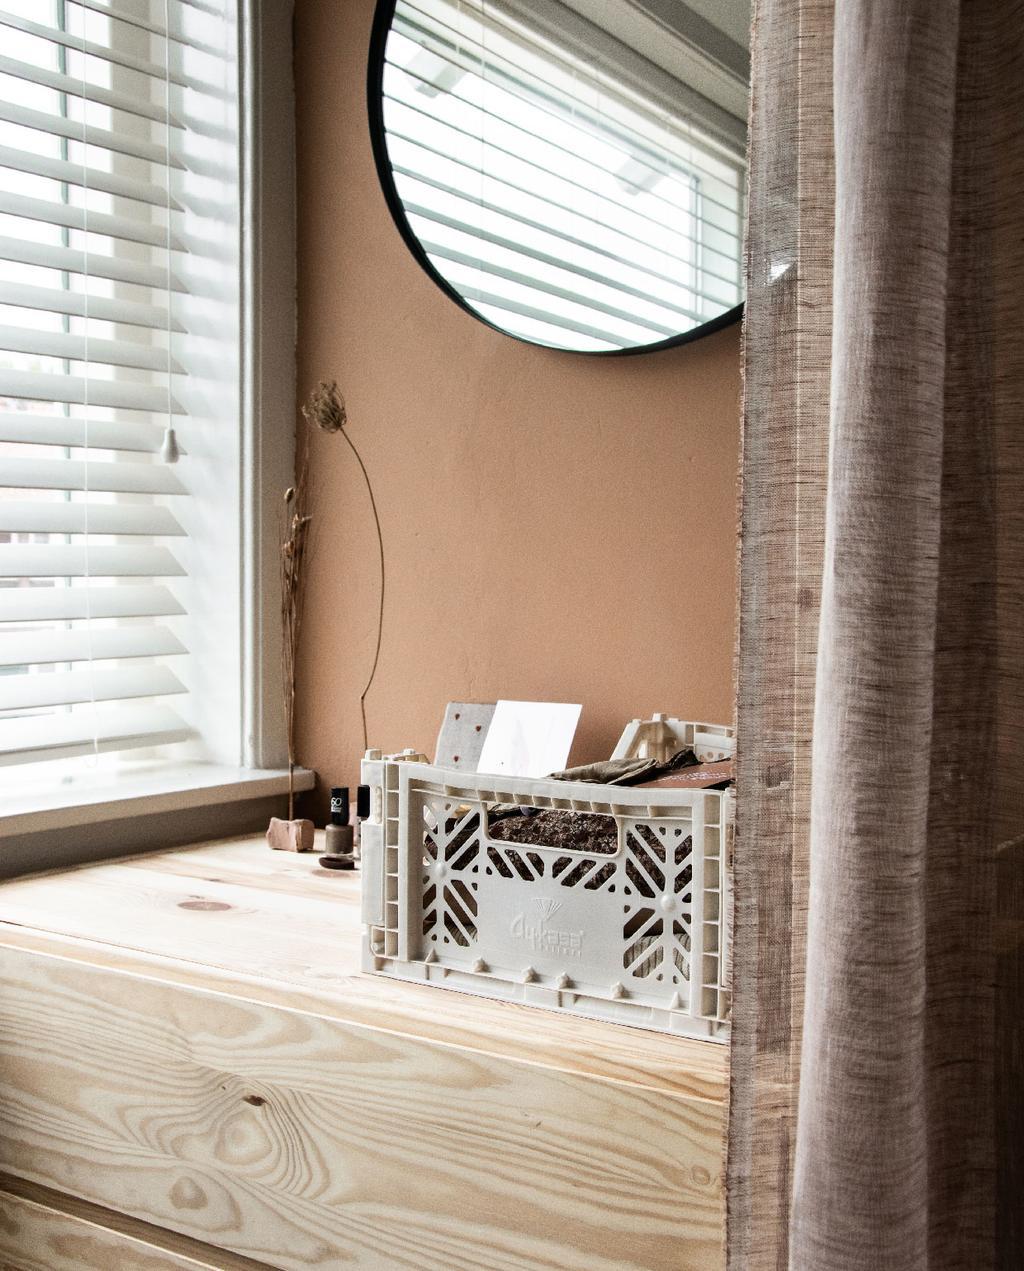 vtwonen blog rachel | open kledingkast ikea ivar diy ronde spiegel